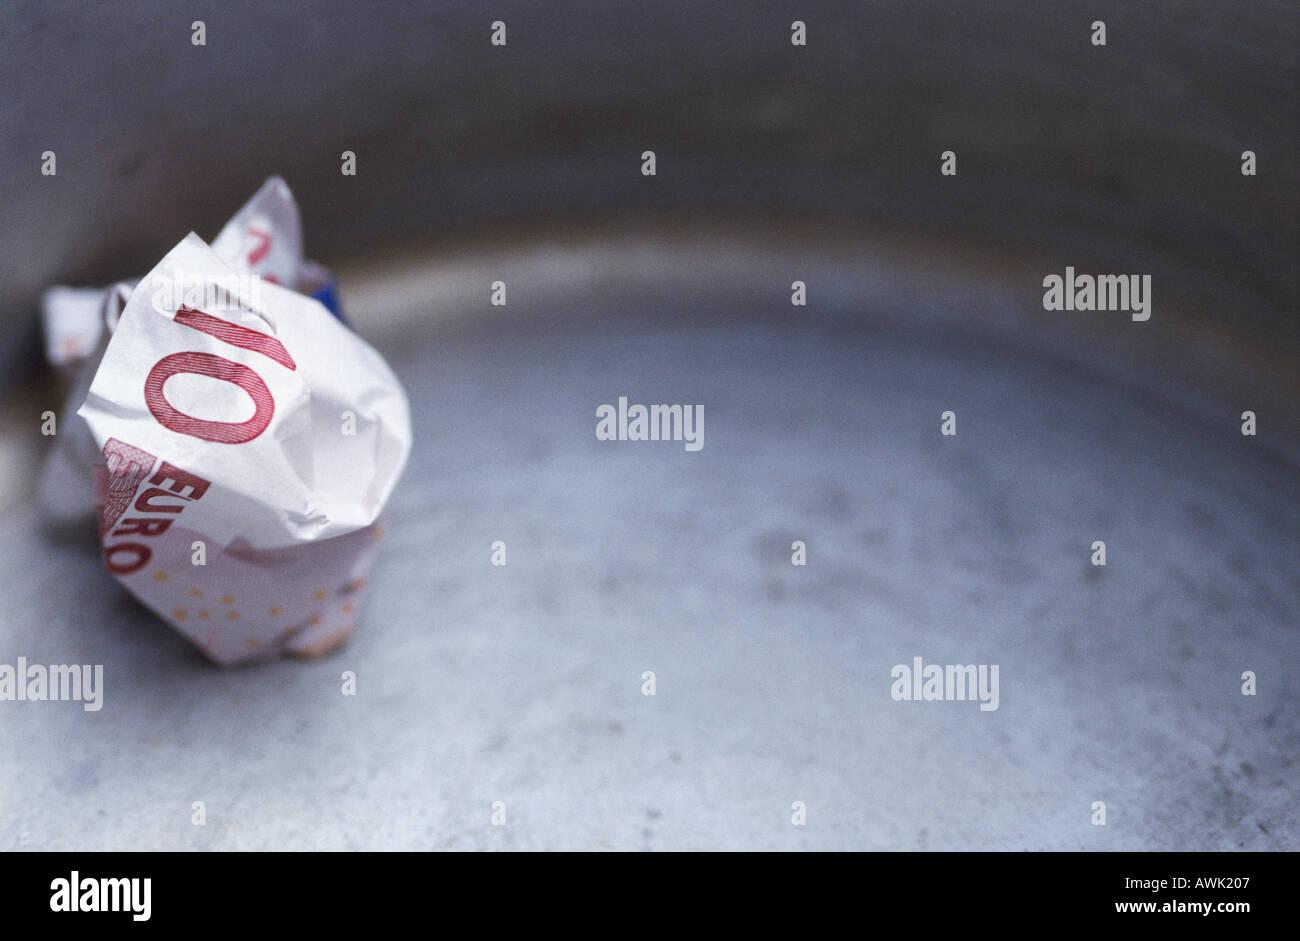 Close-up of ten Euro banknote in garbage bin - Stock Image